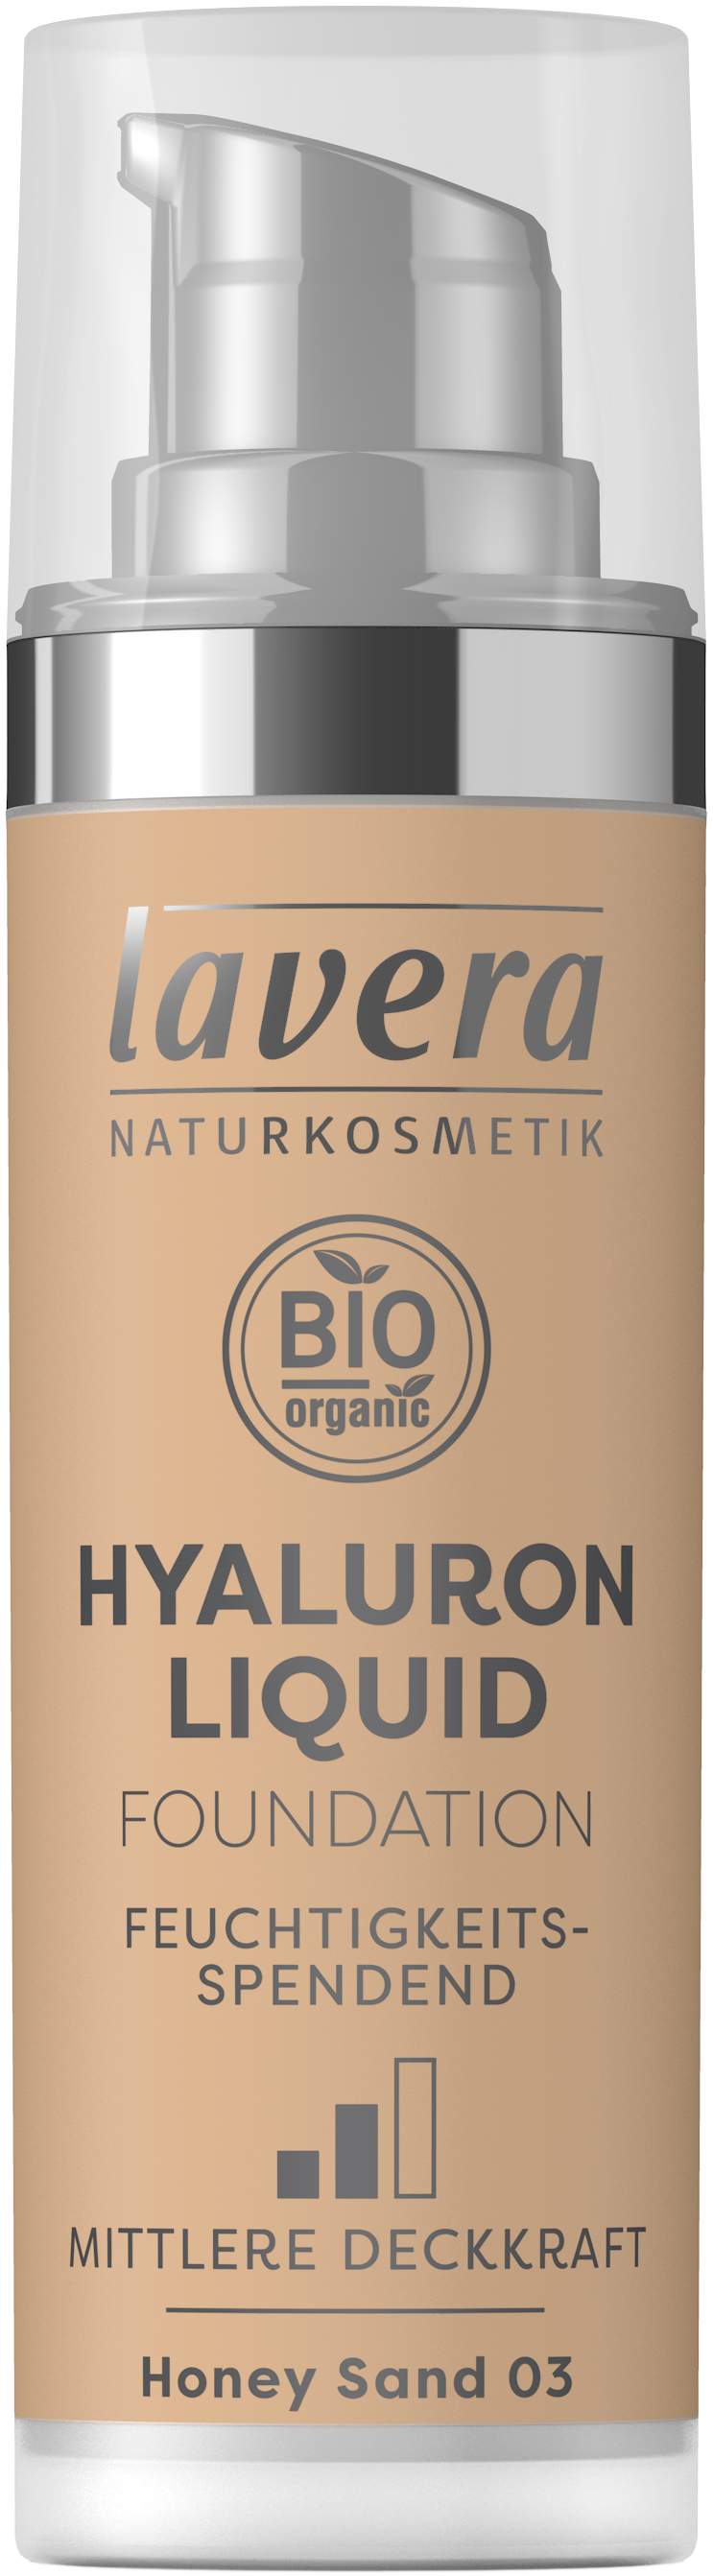 Hyaluron Liquid Foundation -Honey Sand 03-